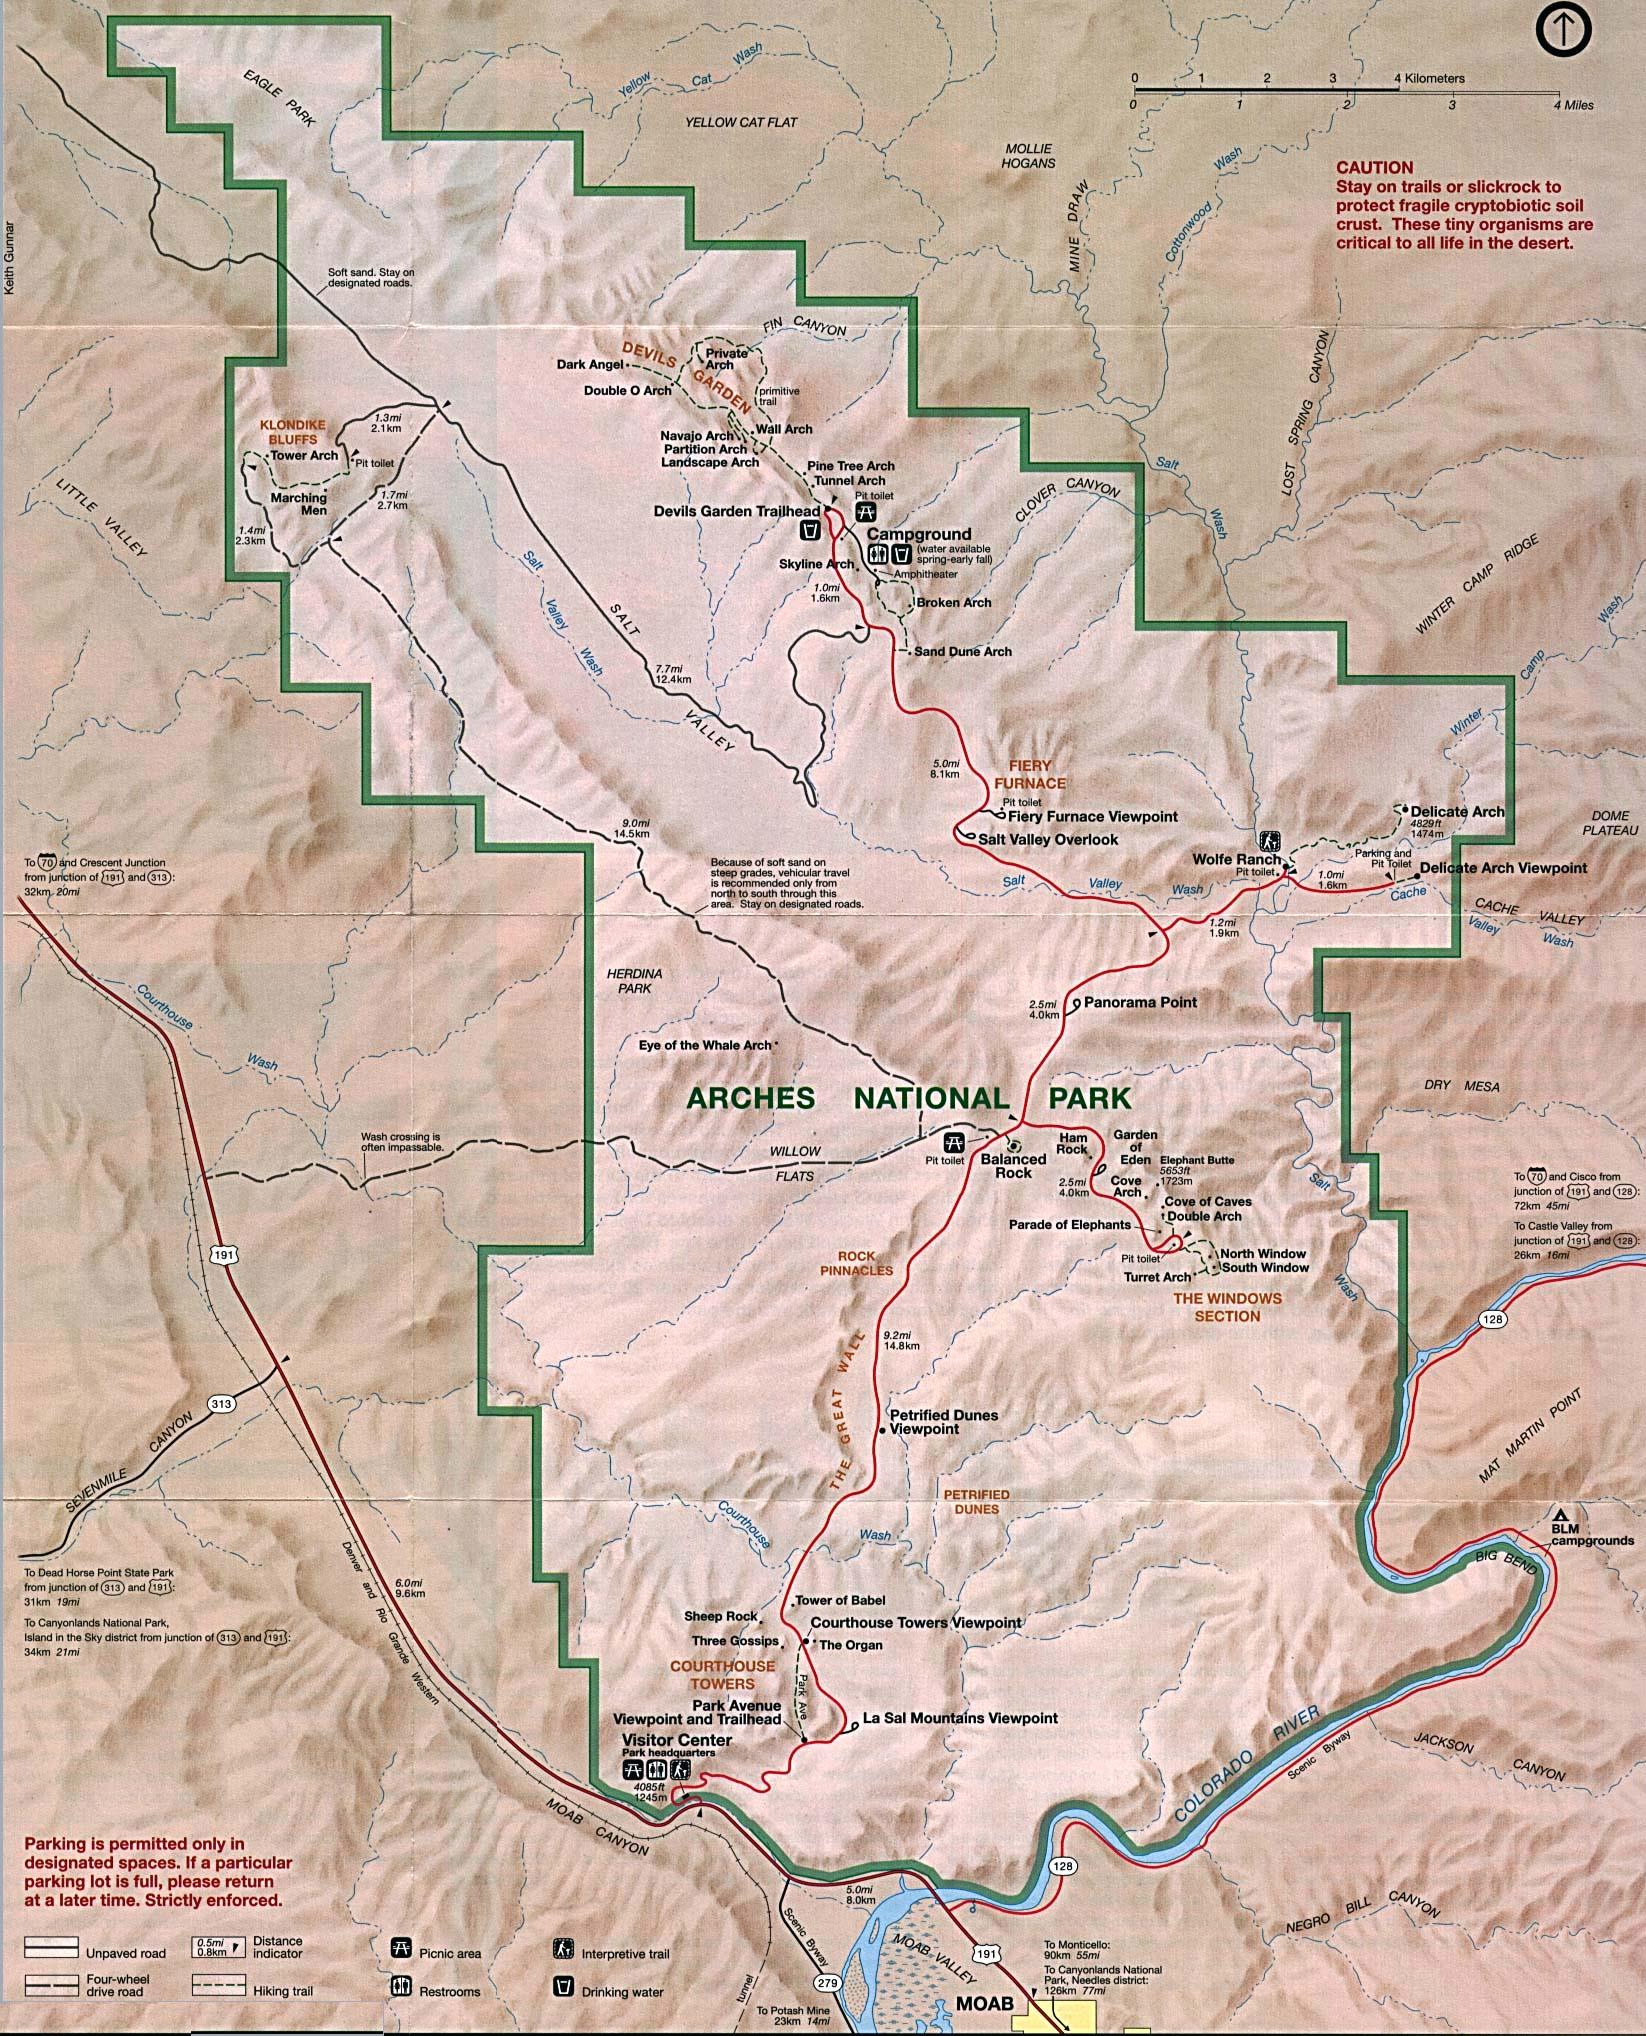 Reisenett: Maps of United States National Parks and Monuments